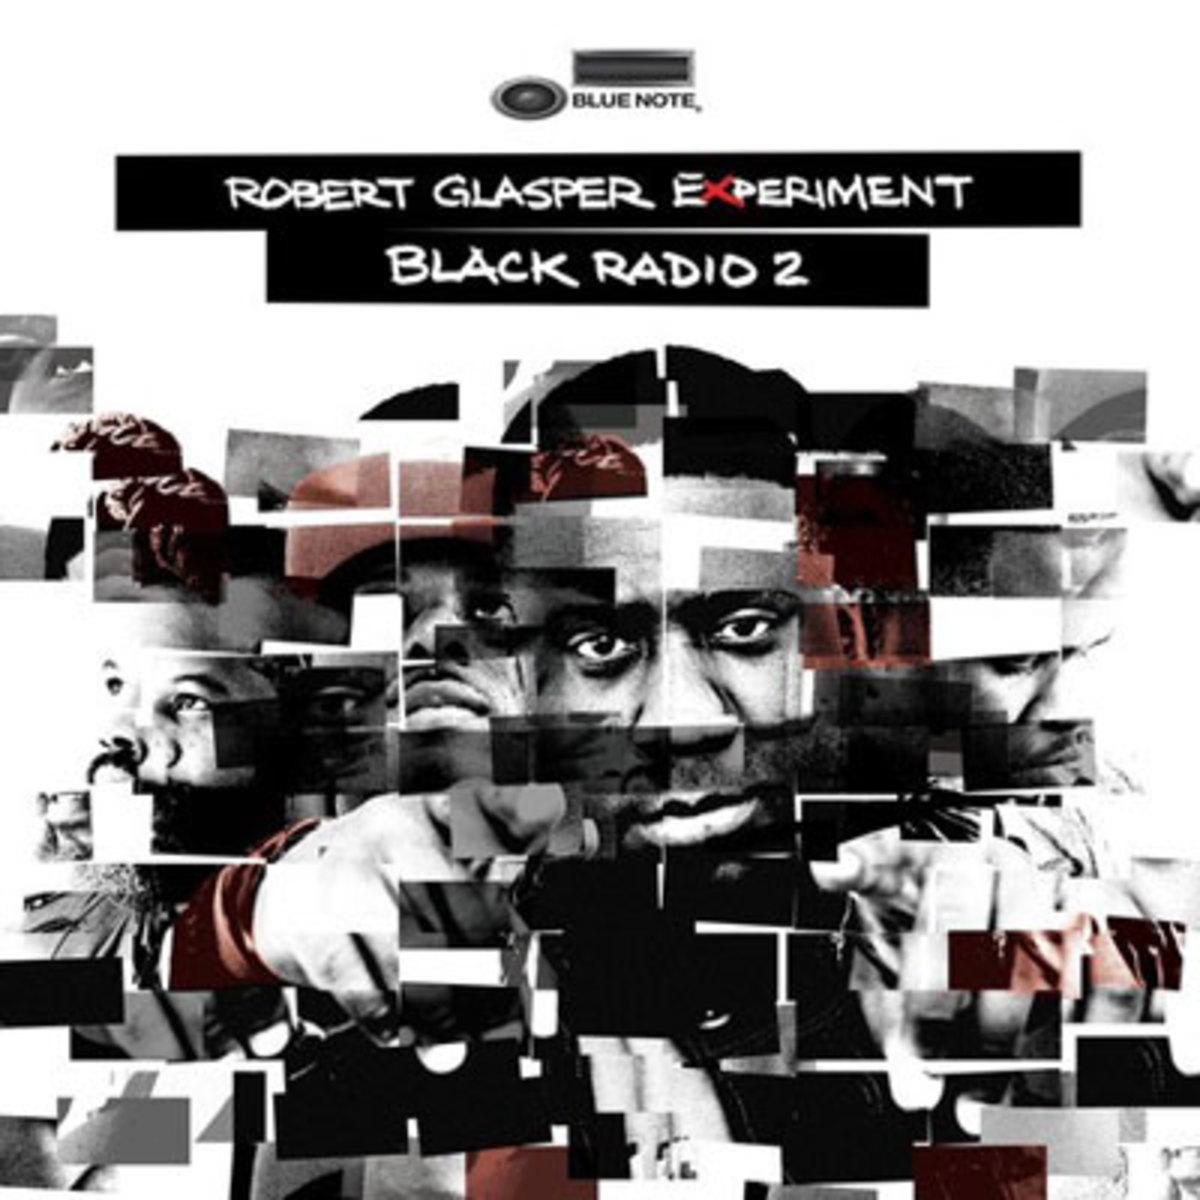 robertglasper-blackradio2.jpg